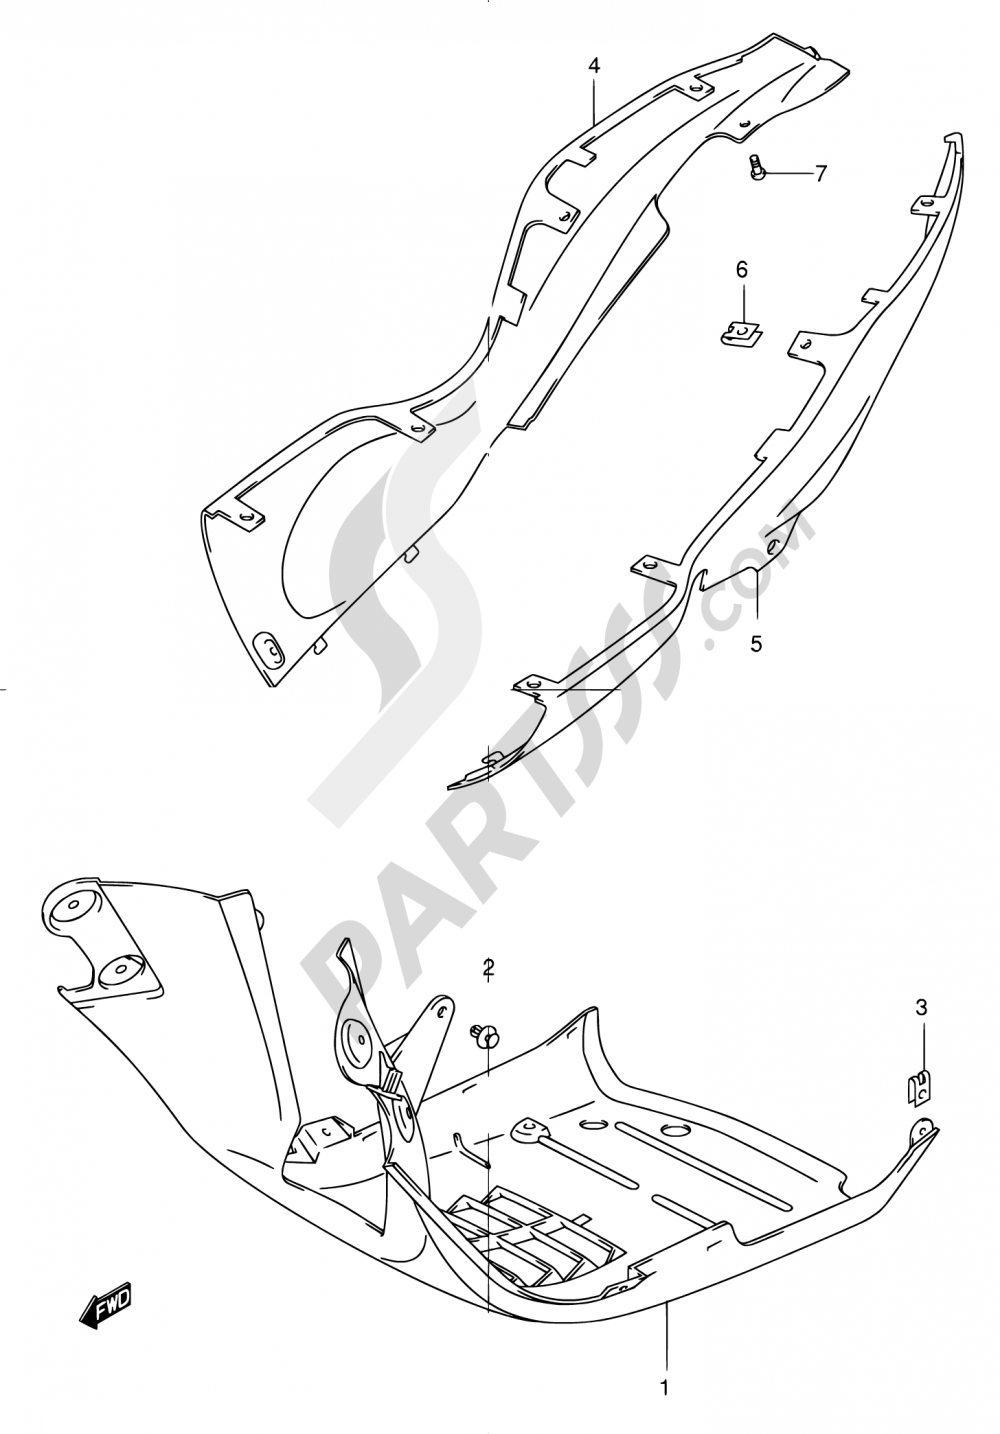 36 - LOWER LEG SHIELD Suzuki EPICURO UC150 2000